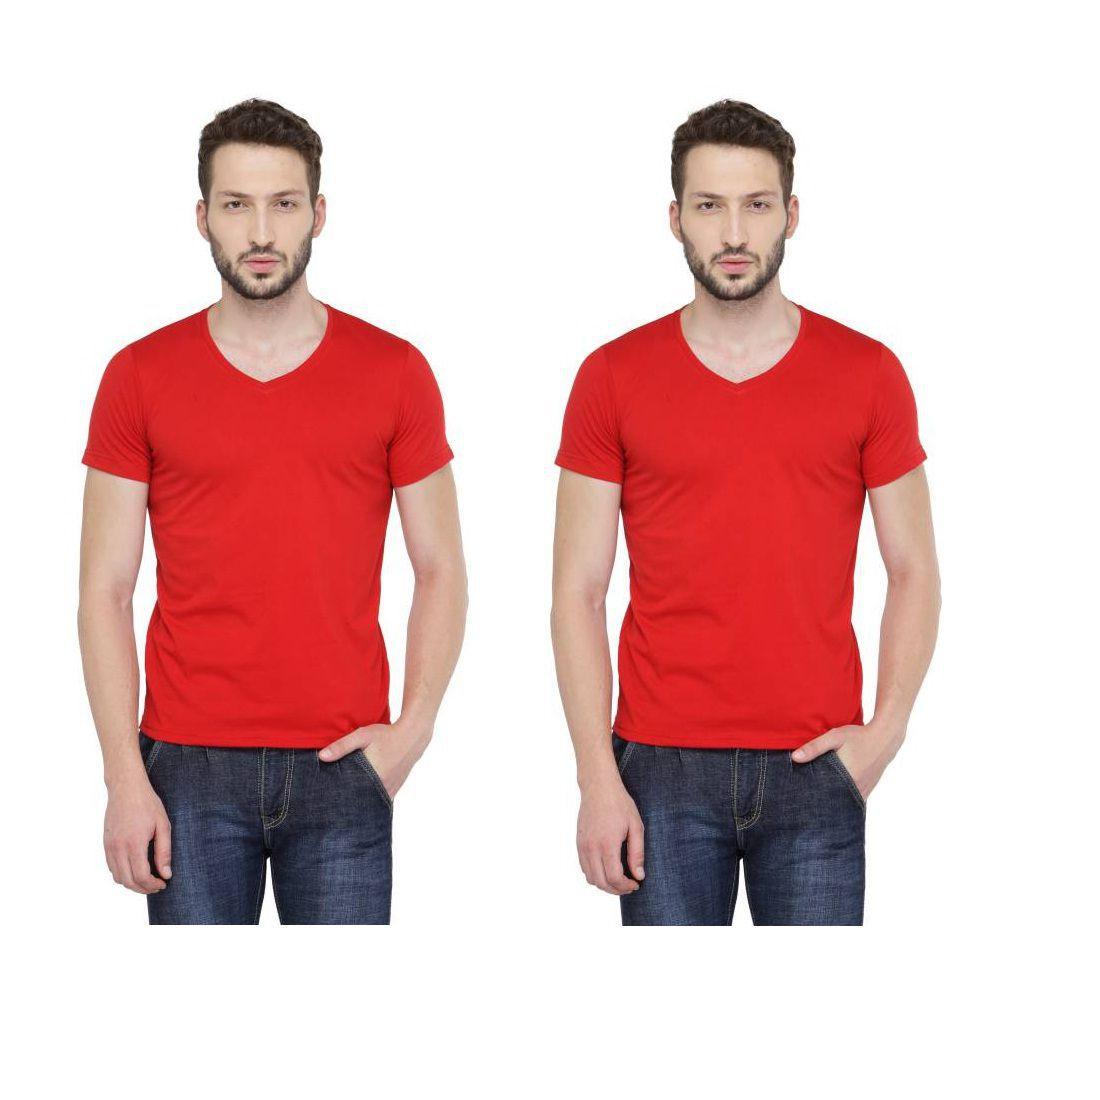 RAJBALLAVI Red V-Neck T-Shirt Pack of 2